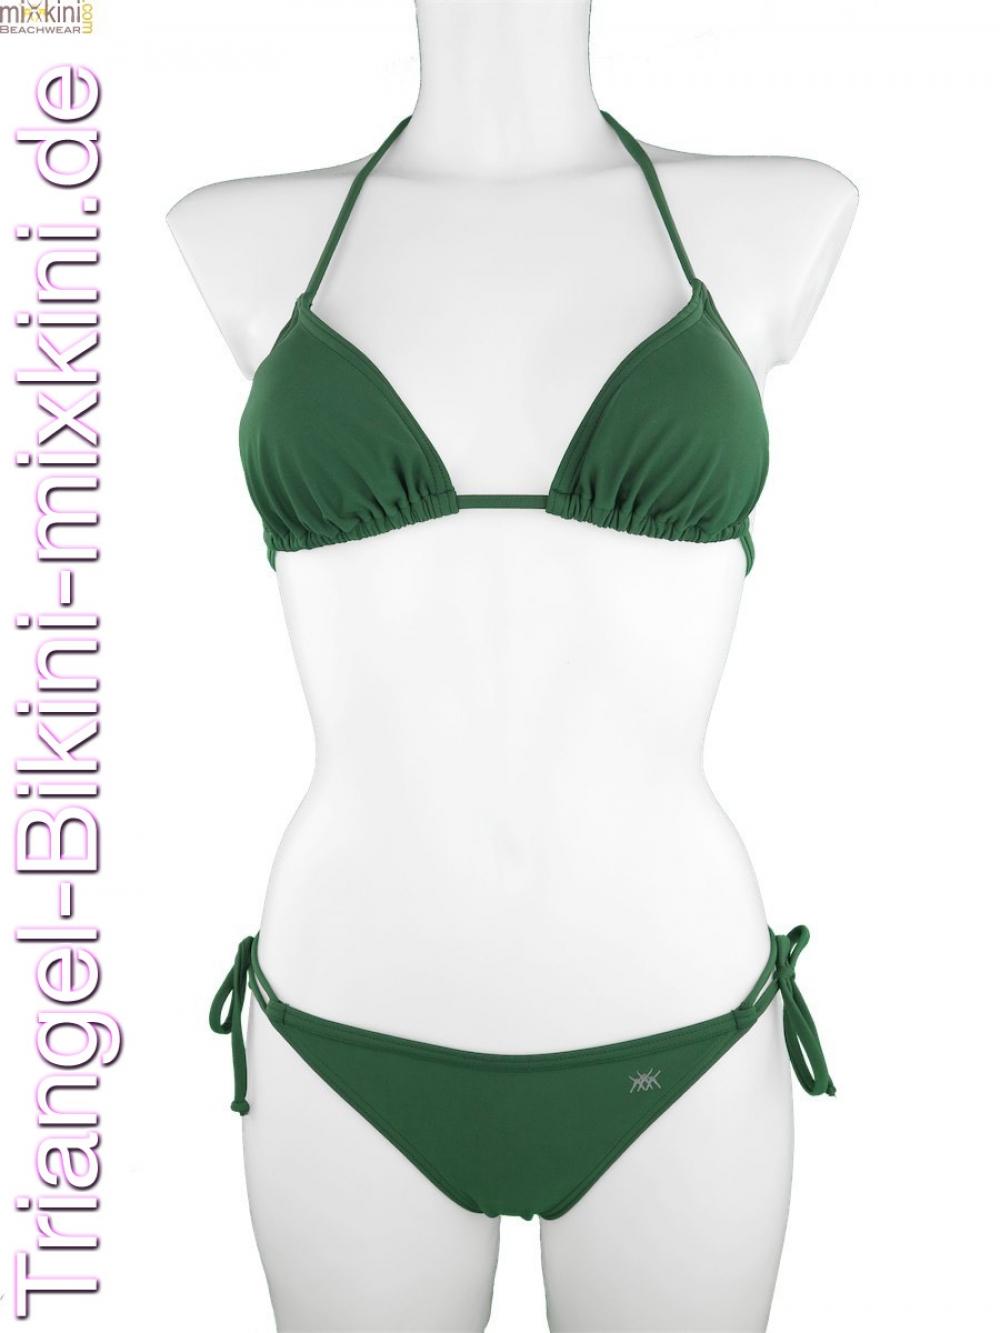 triangel bikini khaki gr n online kaufen mixkini beachwear. Black Bedroom Furniture Sets. Home Design Ideas